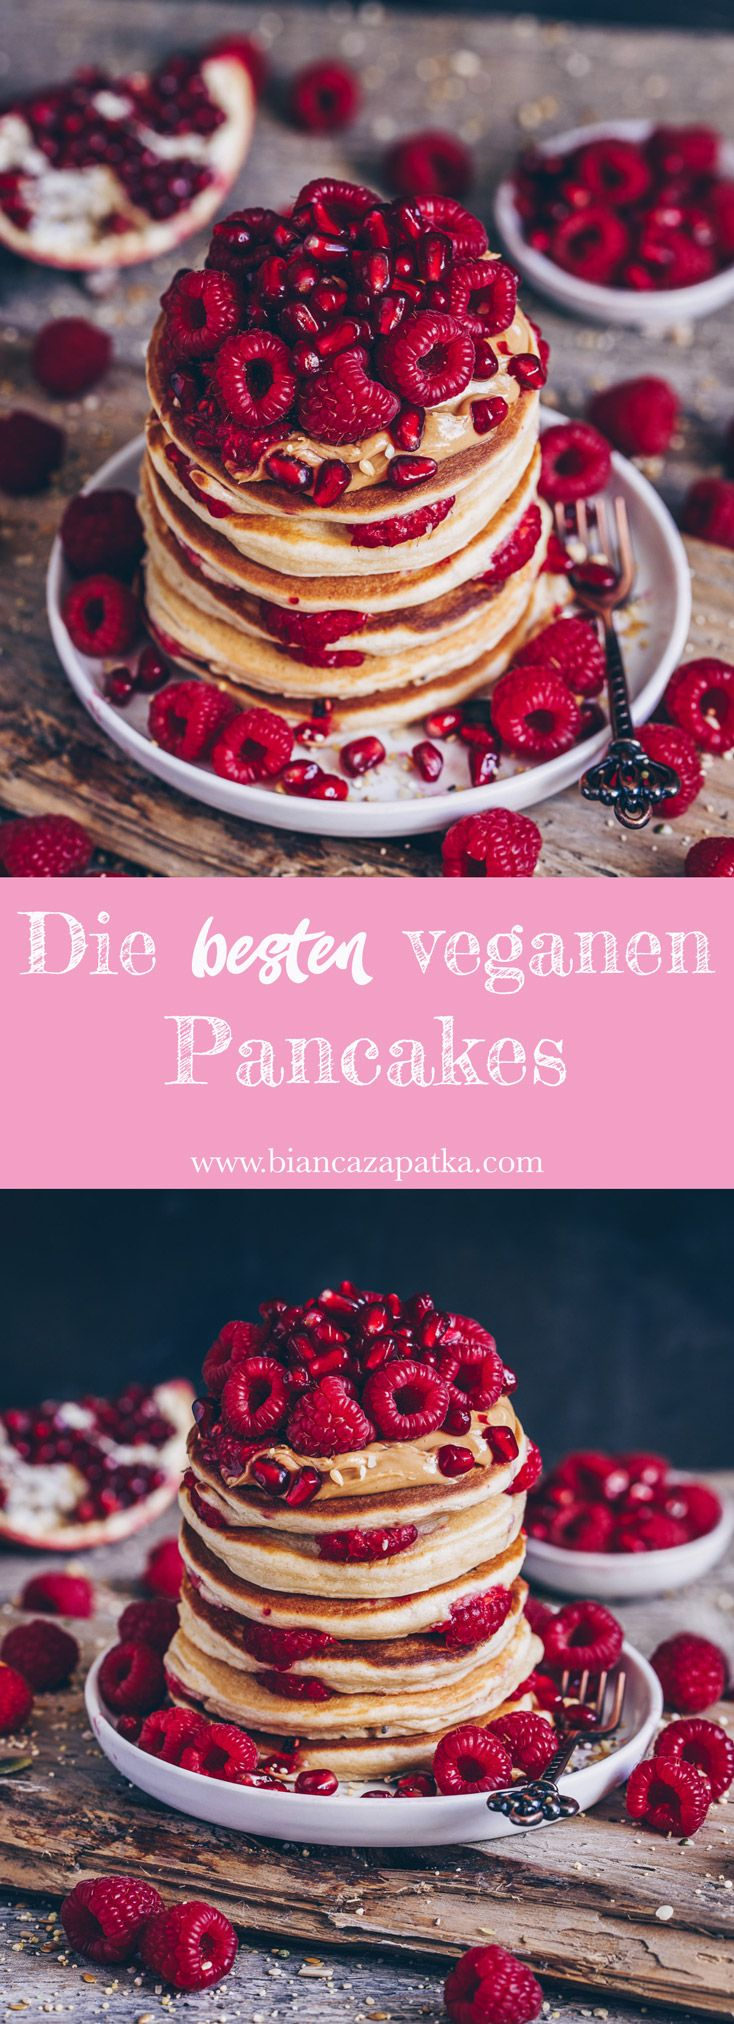 Die besten veganen Pancakes - Bianca Zapatka   Rezepte